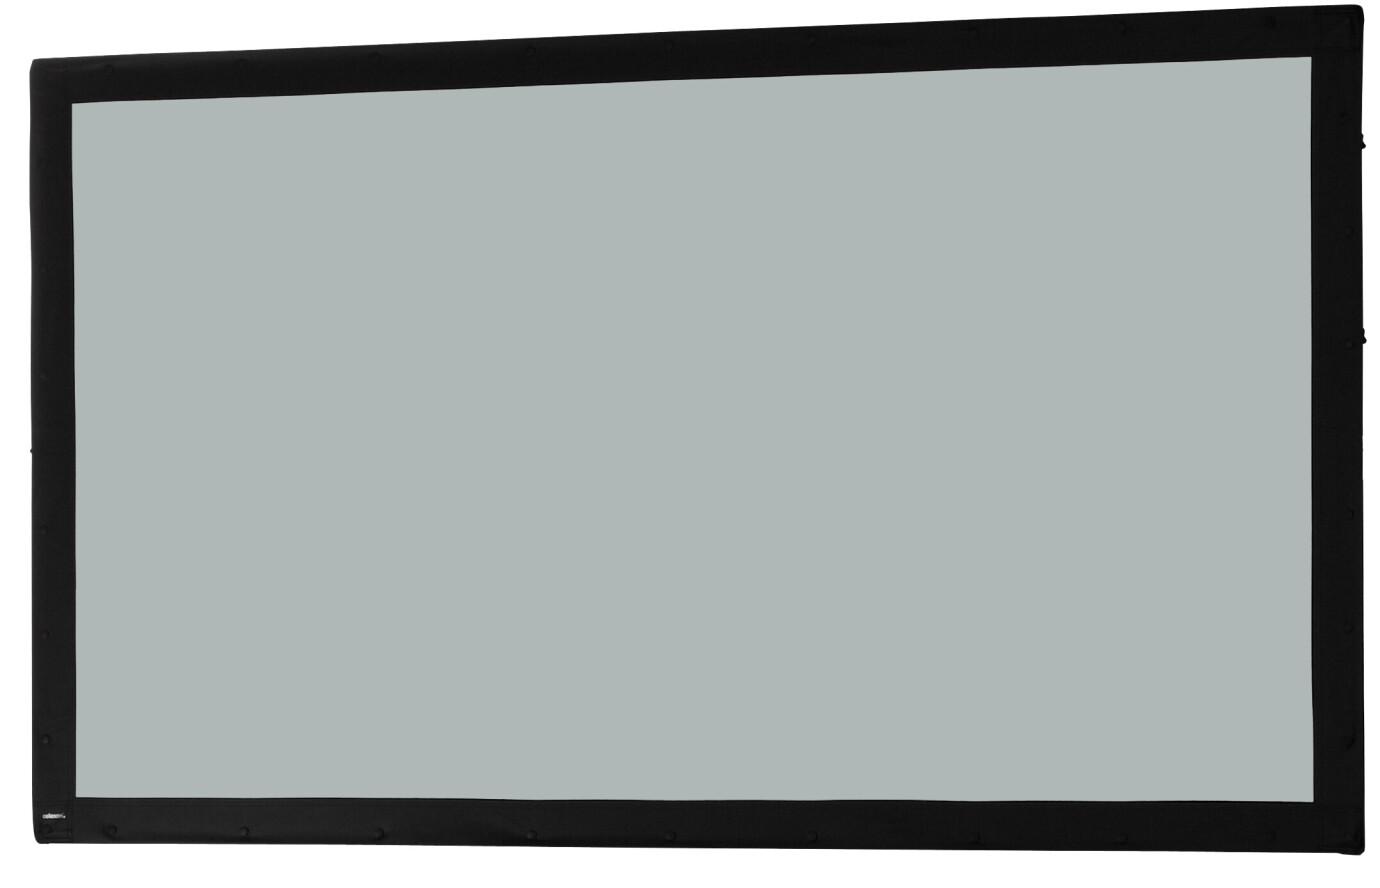 celexon Tuch für Faltrahmen Mobil Expert - 366 x 206 cm Rückprojektion